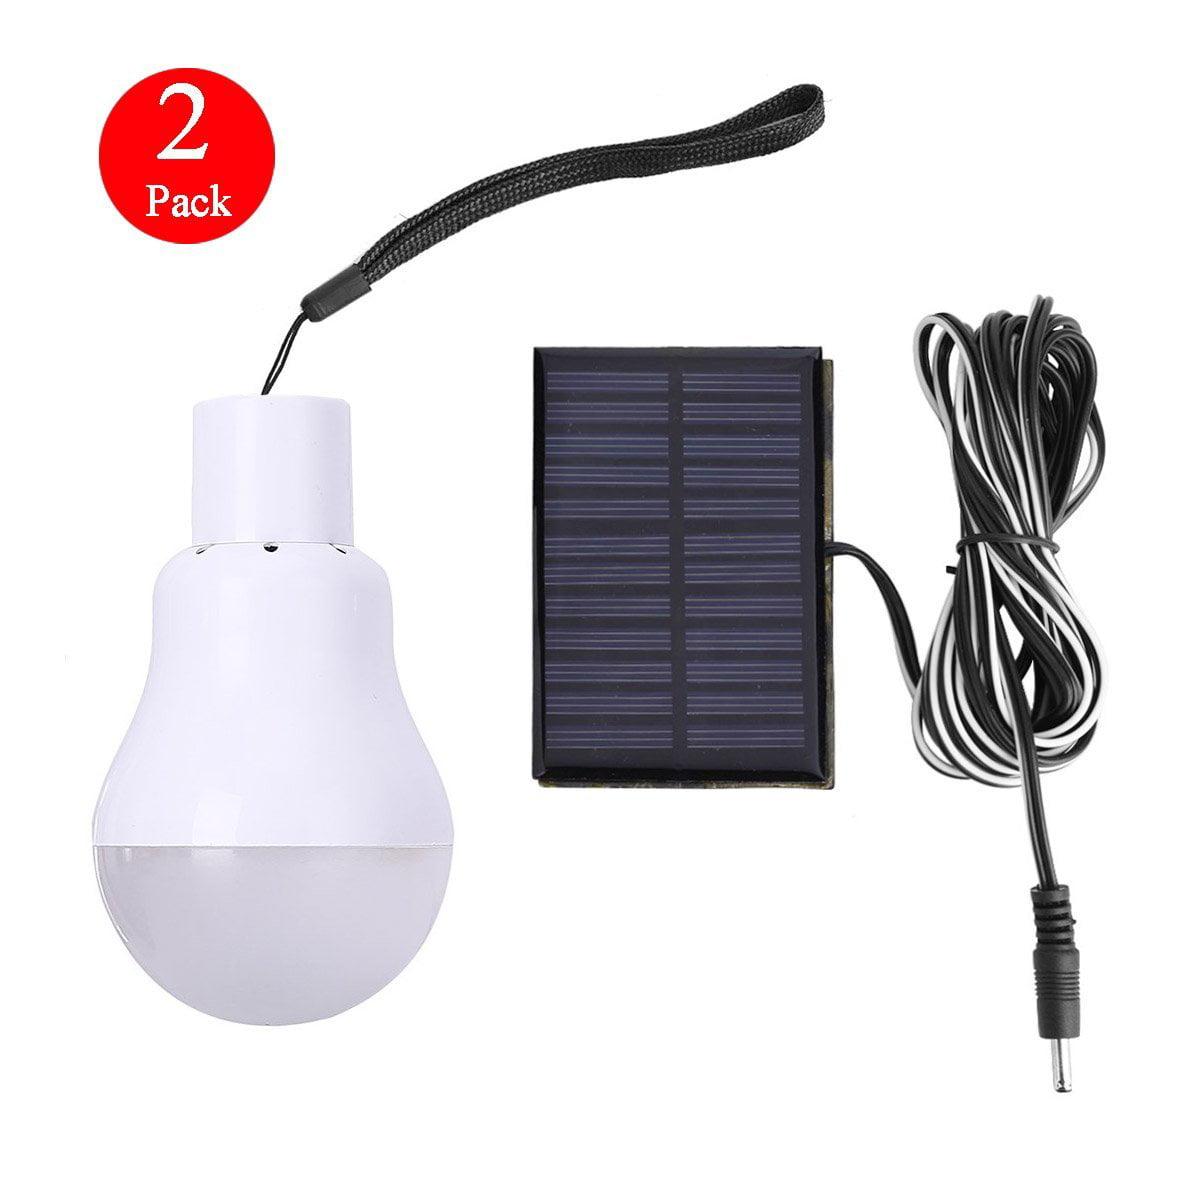 EEEKit Portable Solar Powered Led Bulb Lights Solar Energy Panel Led Lamp Lighting for Hiking Fishing Camping Tent Emergency Use